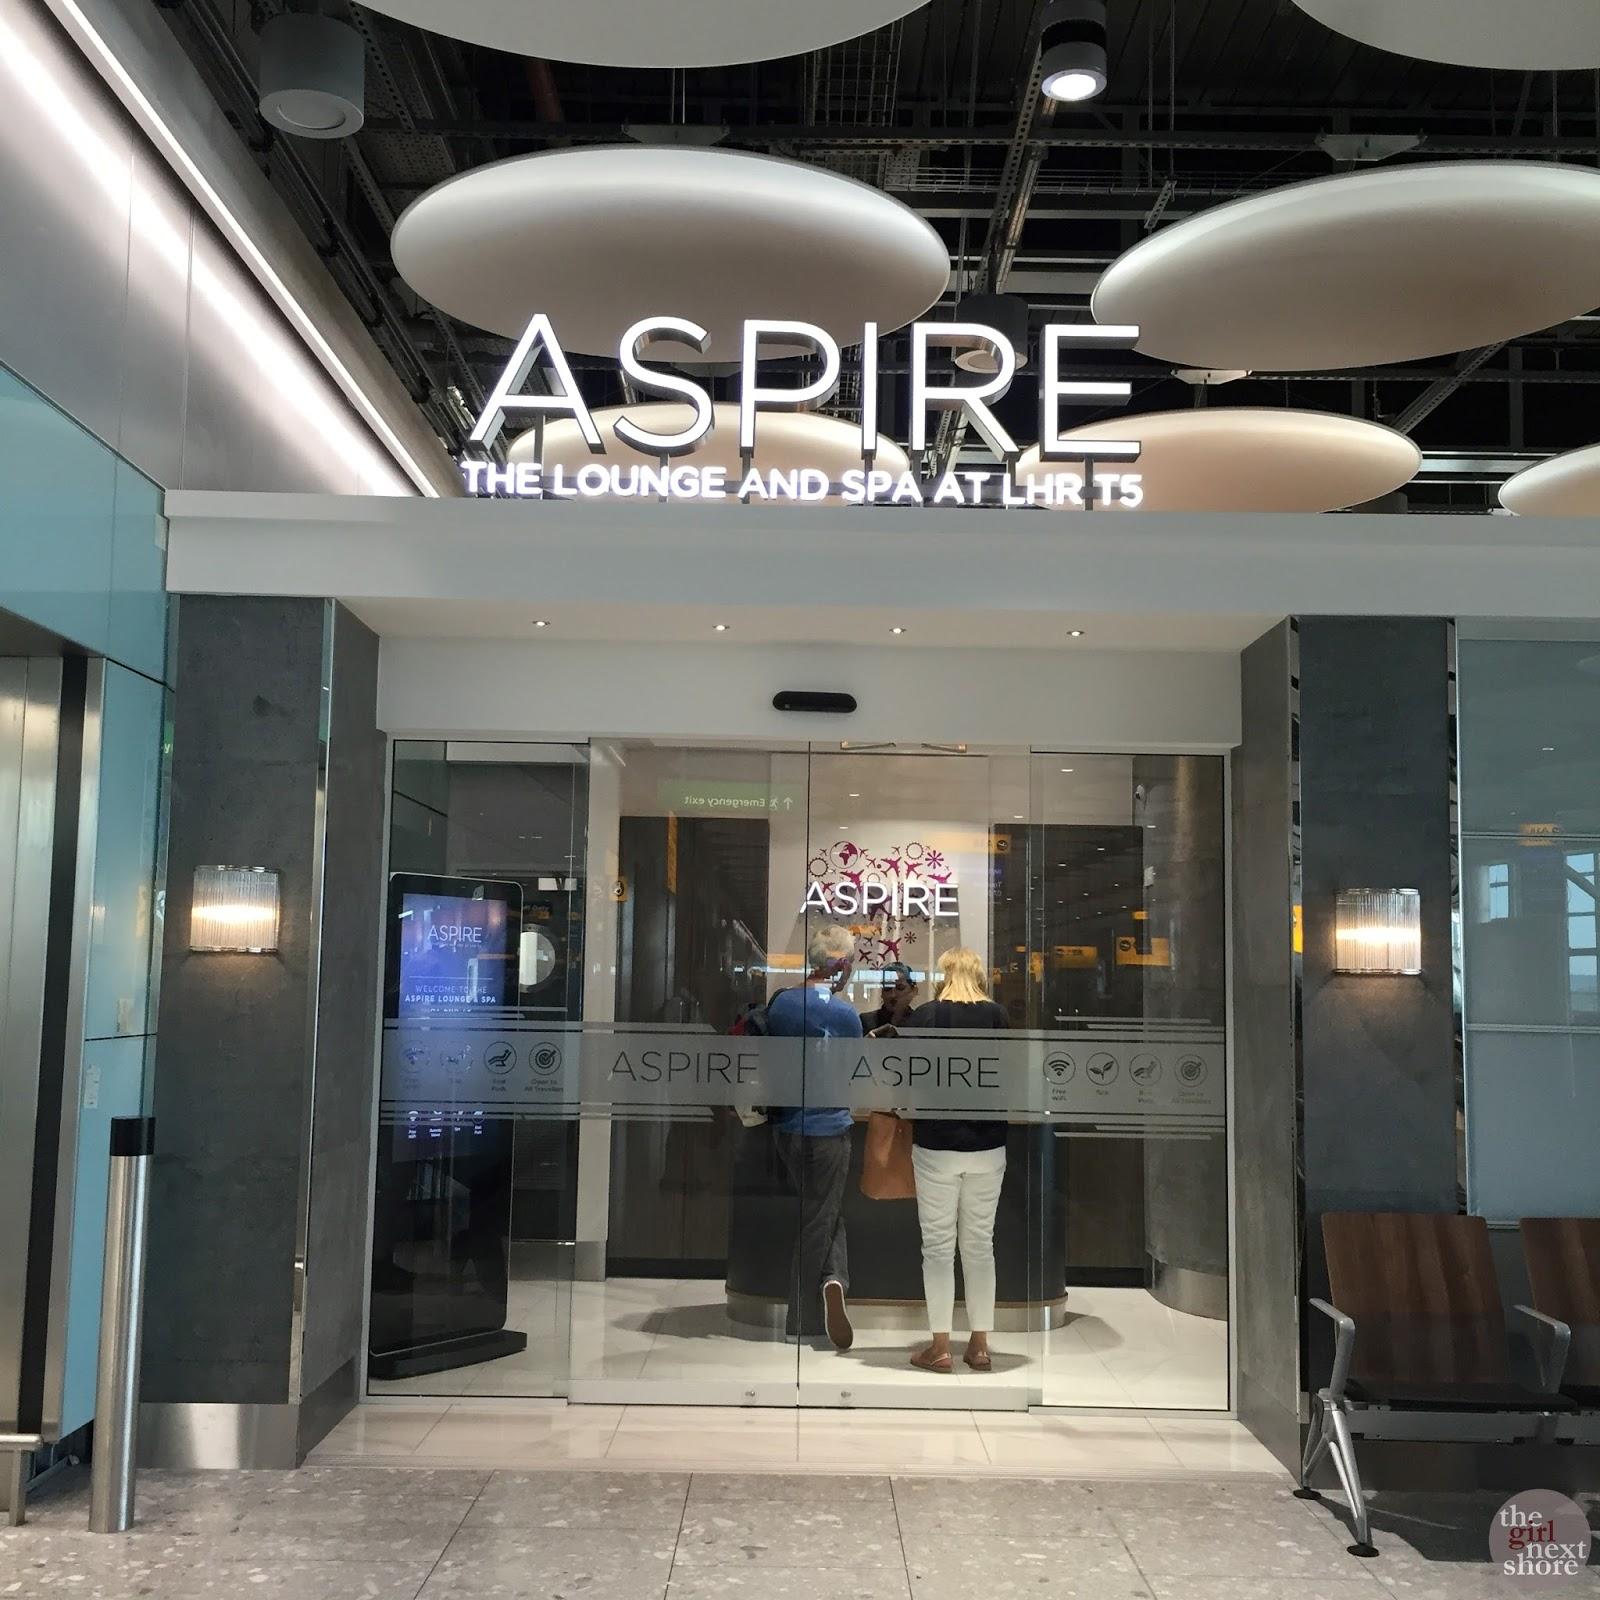 Aspire executive lounge spa london heathrow terminal 5 for Salon lounge